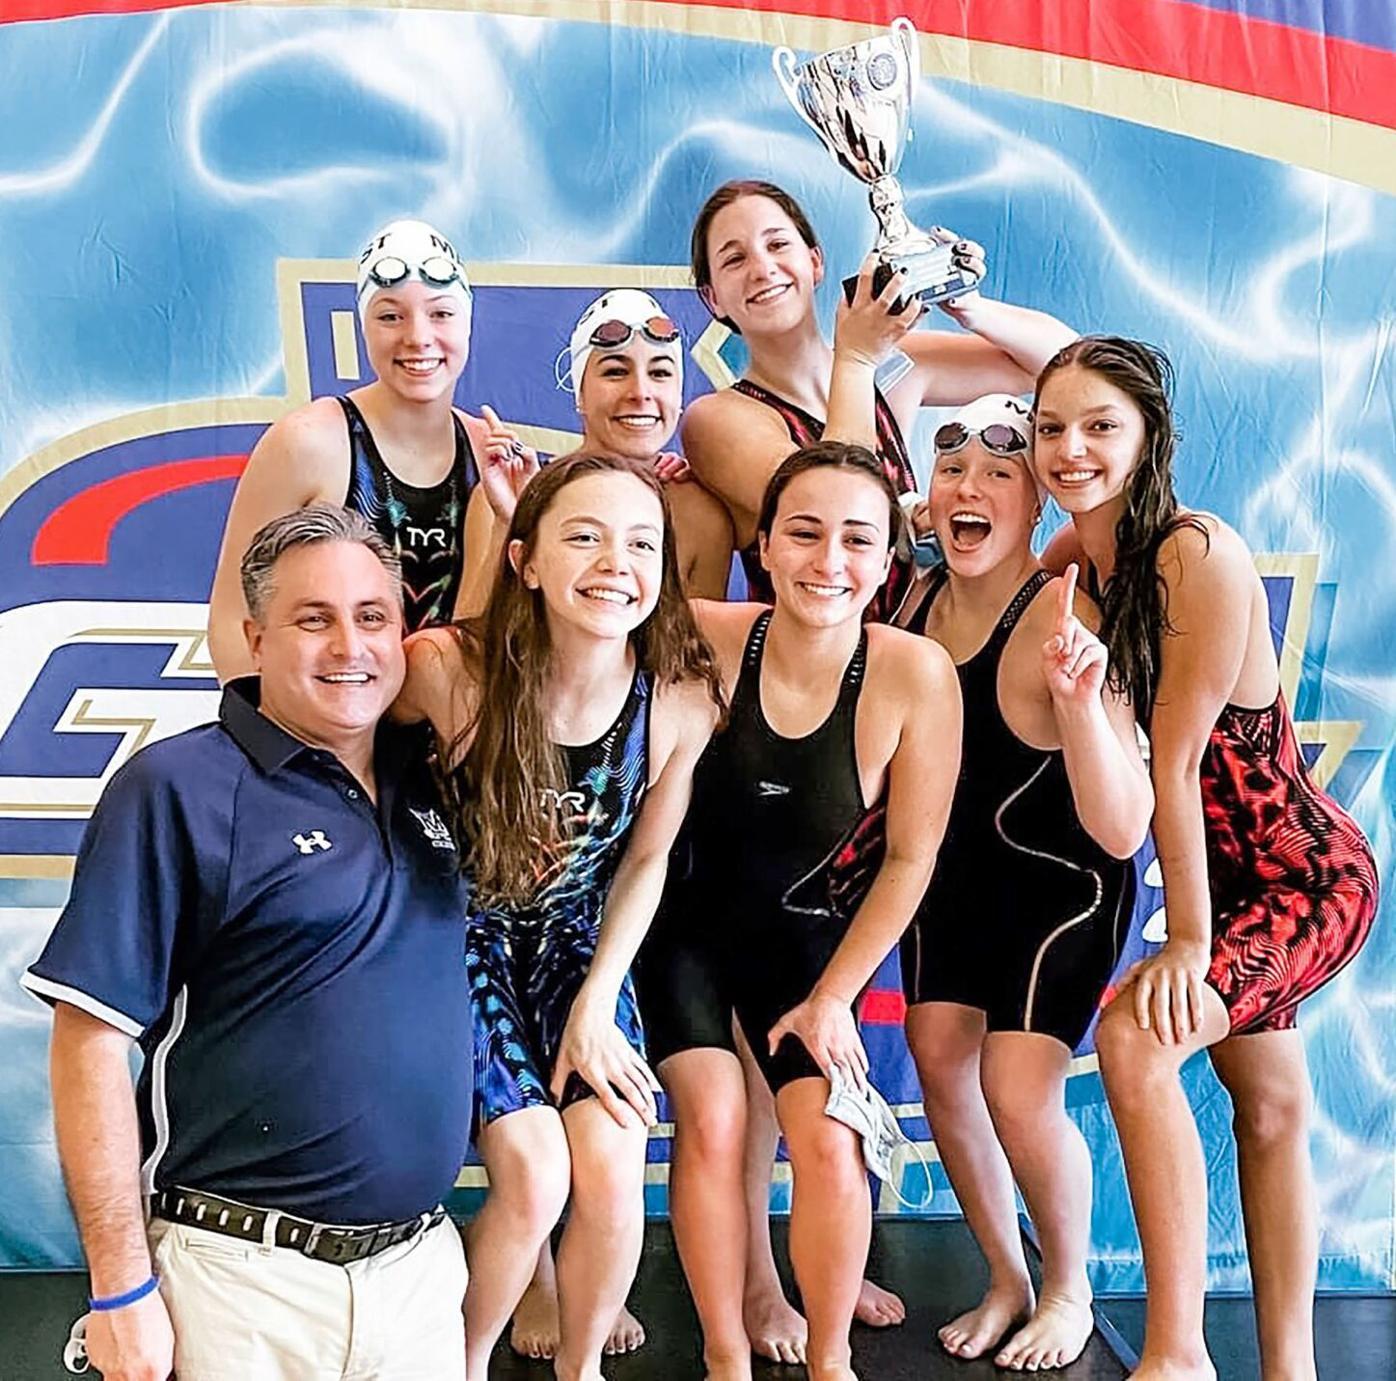 021721_MNS_Nside_swimming_002 Marist girls' team group